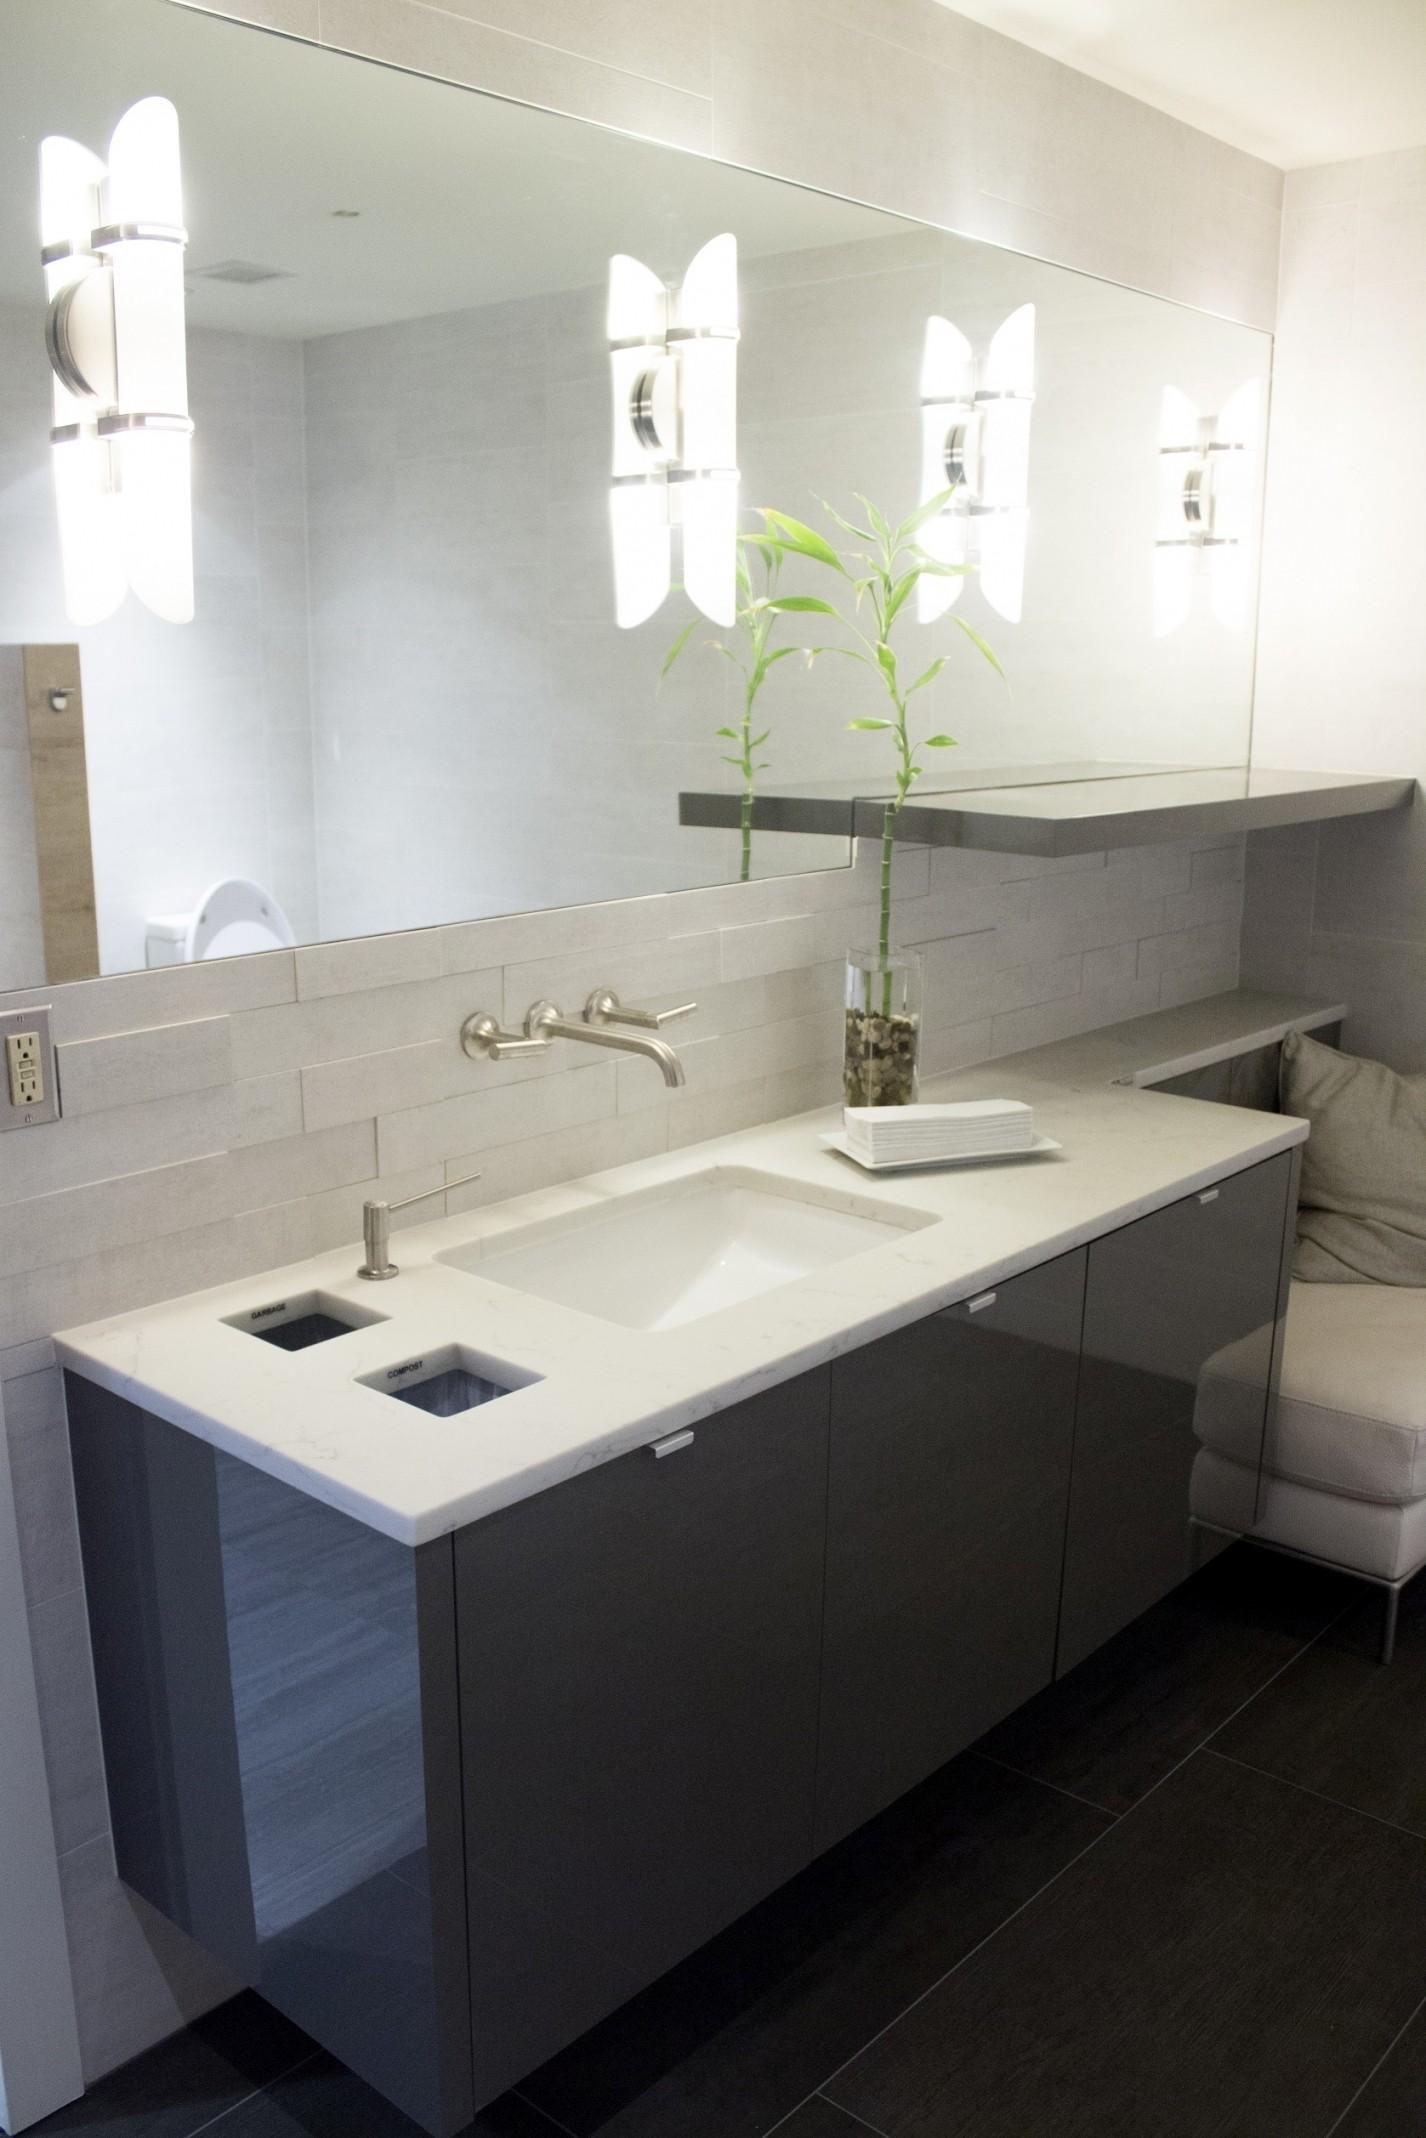 Bathroom Showroom Seattle Fantastic Bathrooms Design Terrific Bathtub Kitchen And Bath Construction